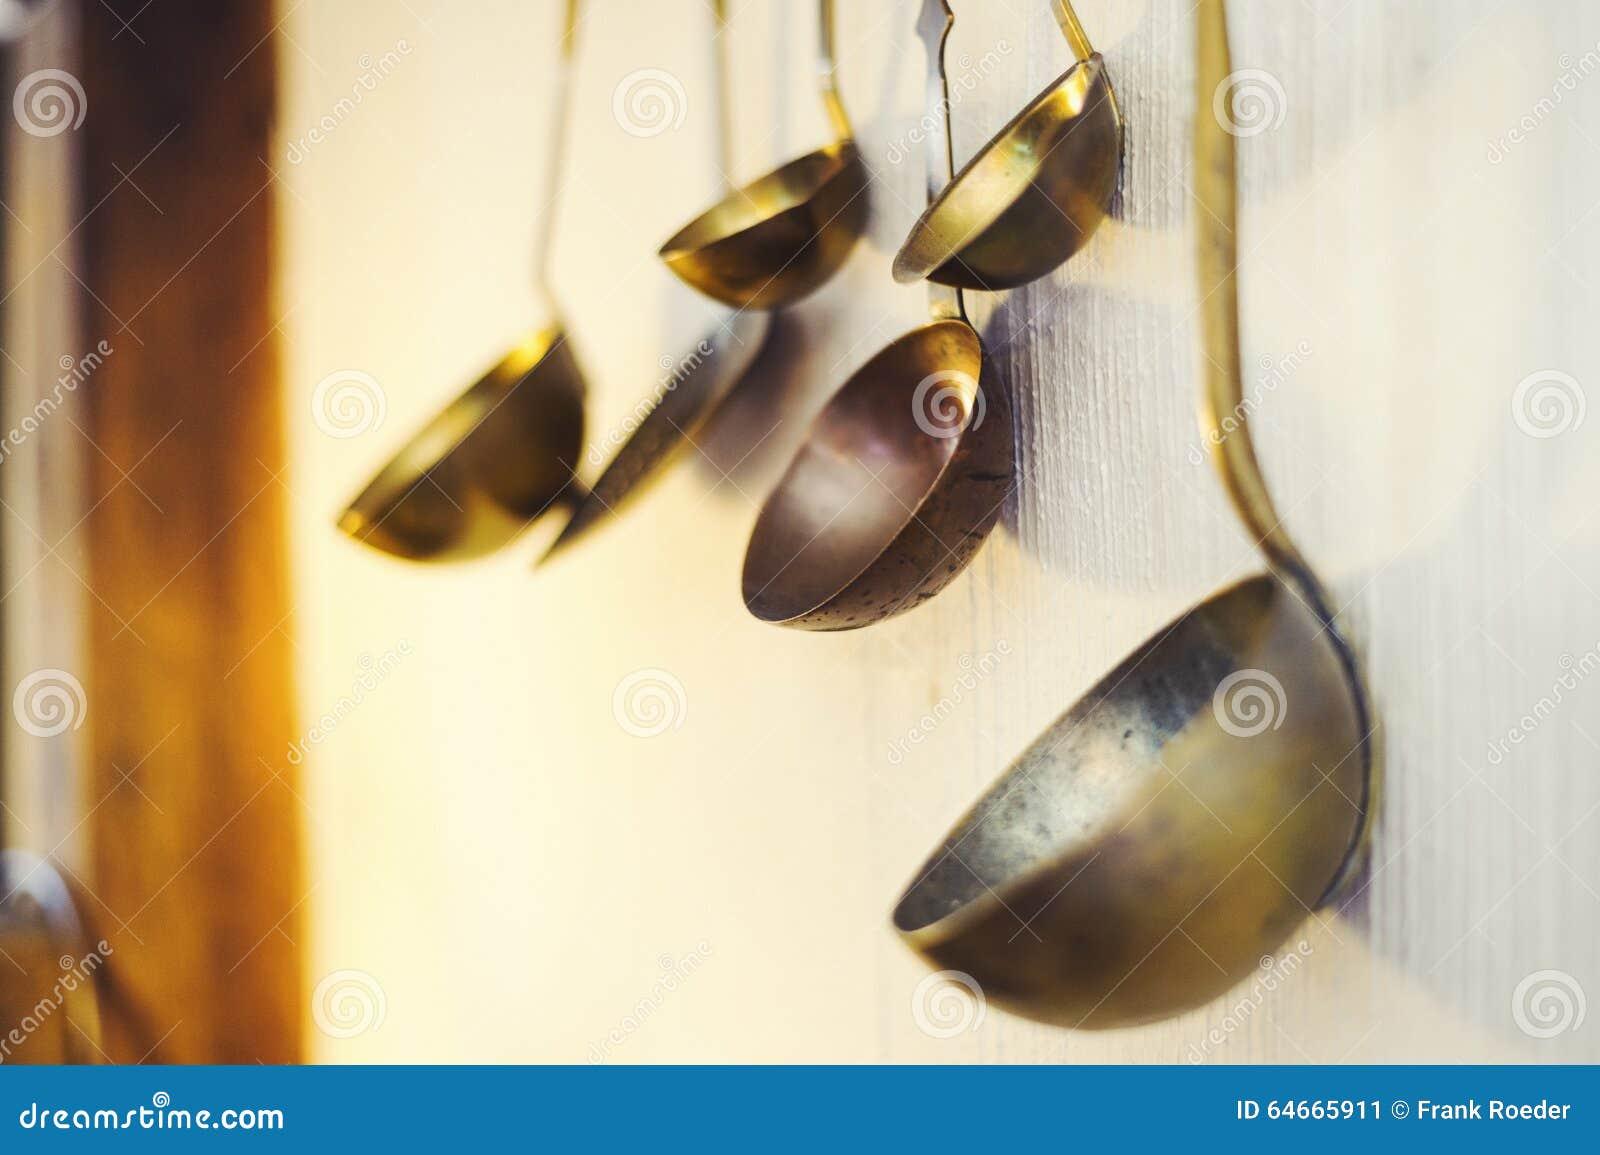 Ladles